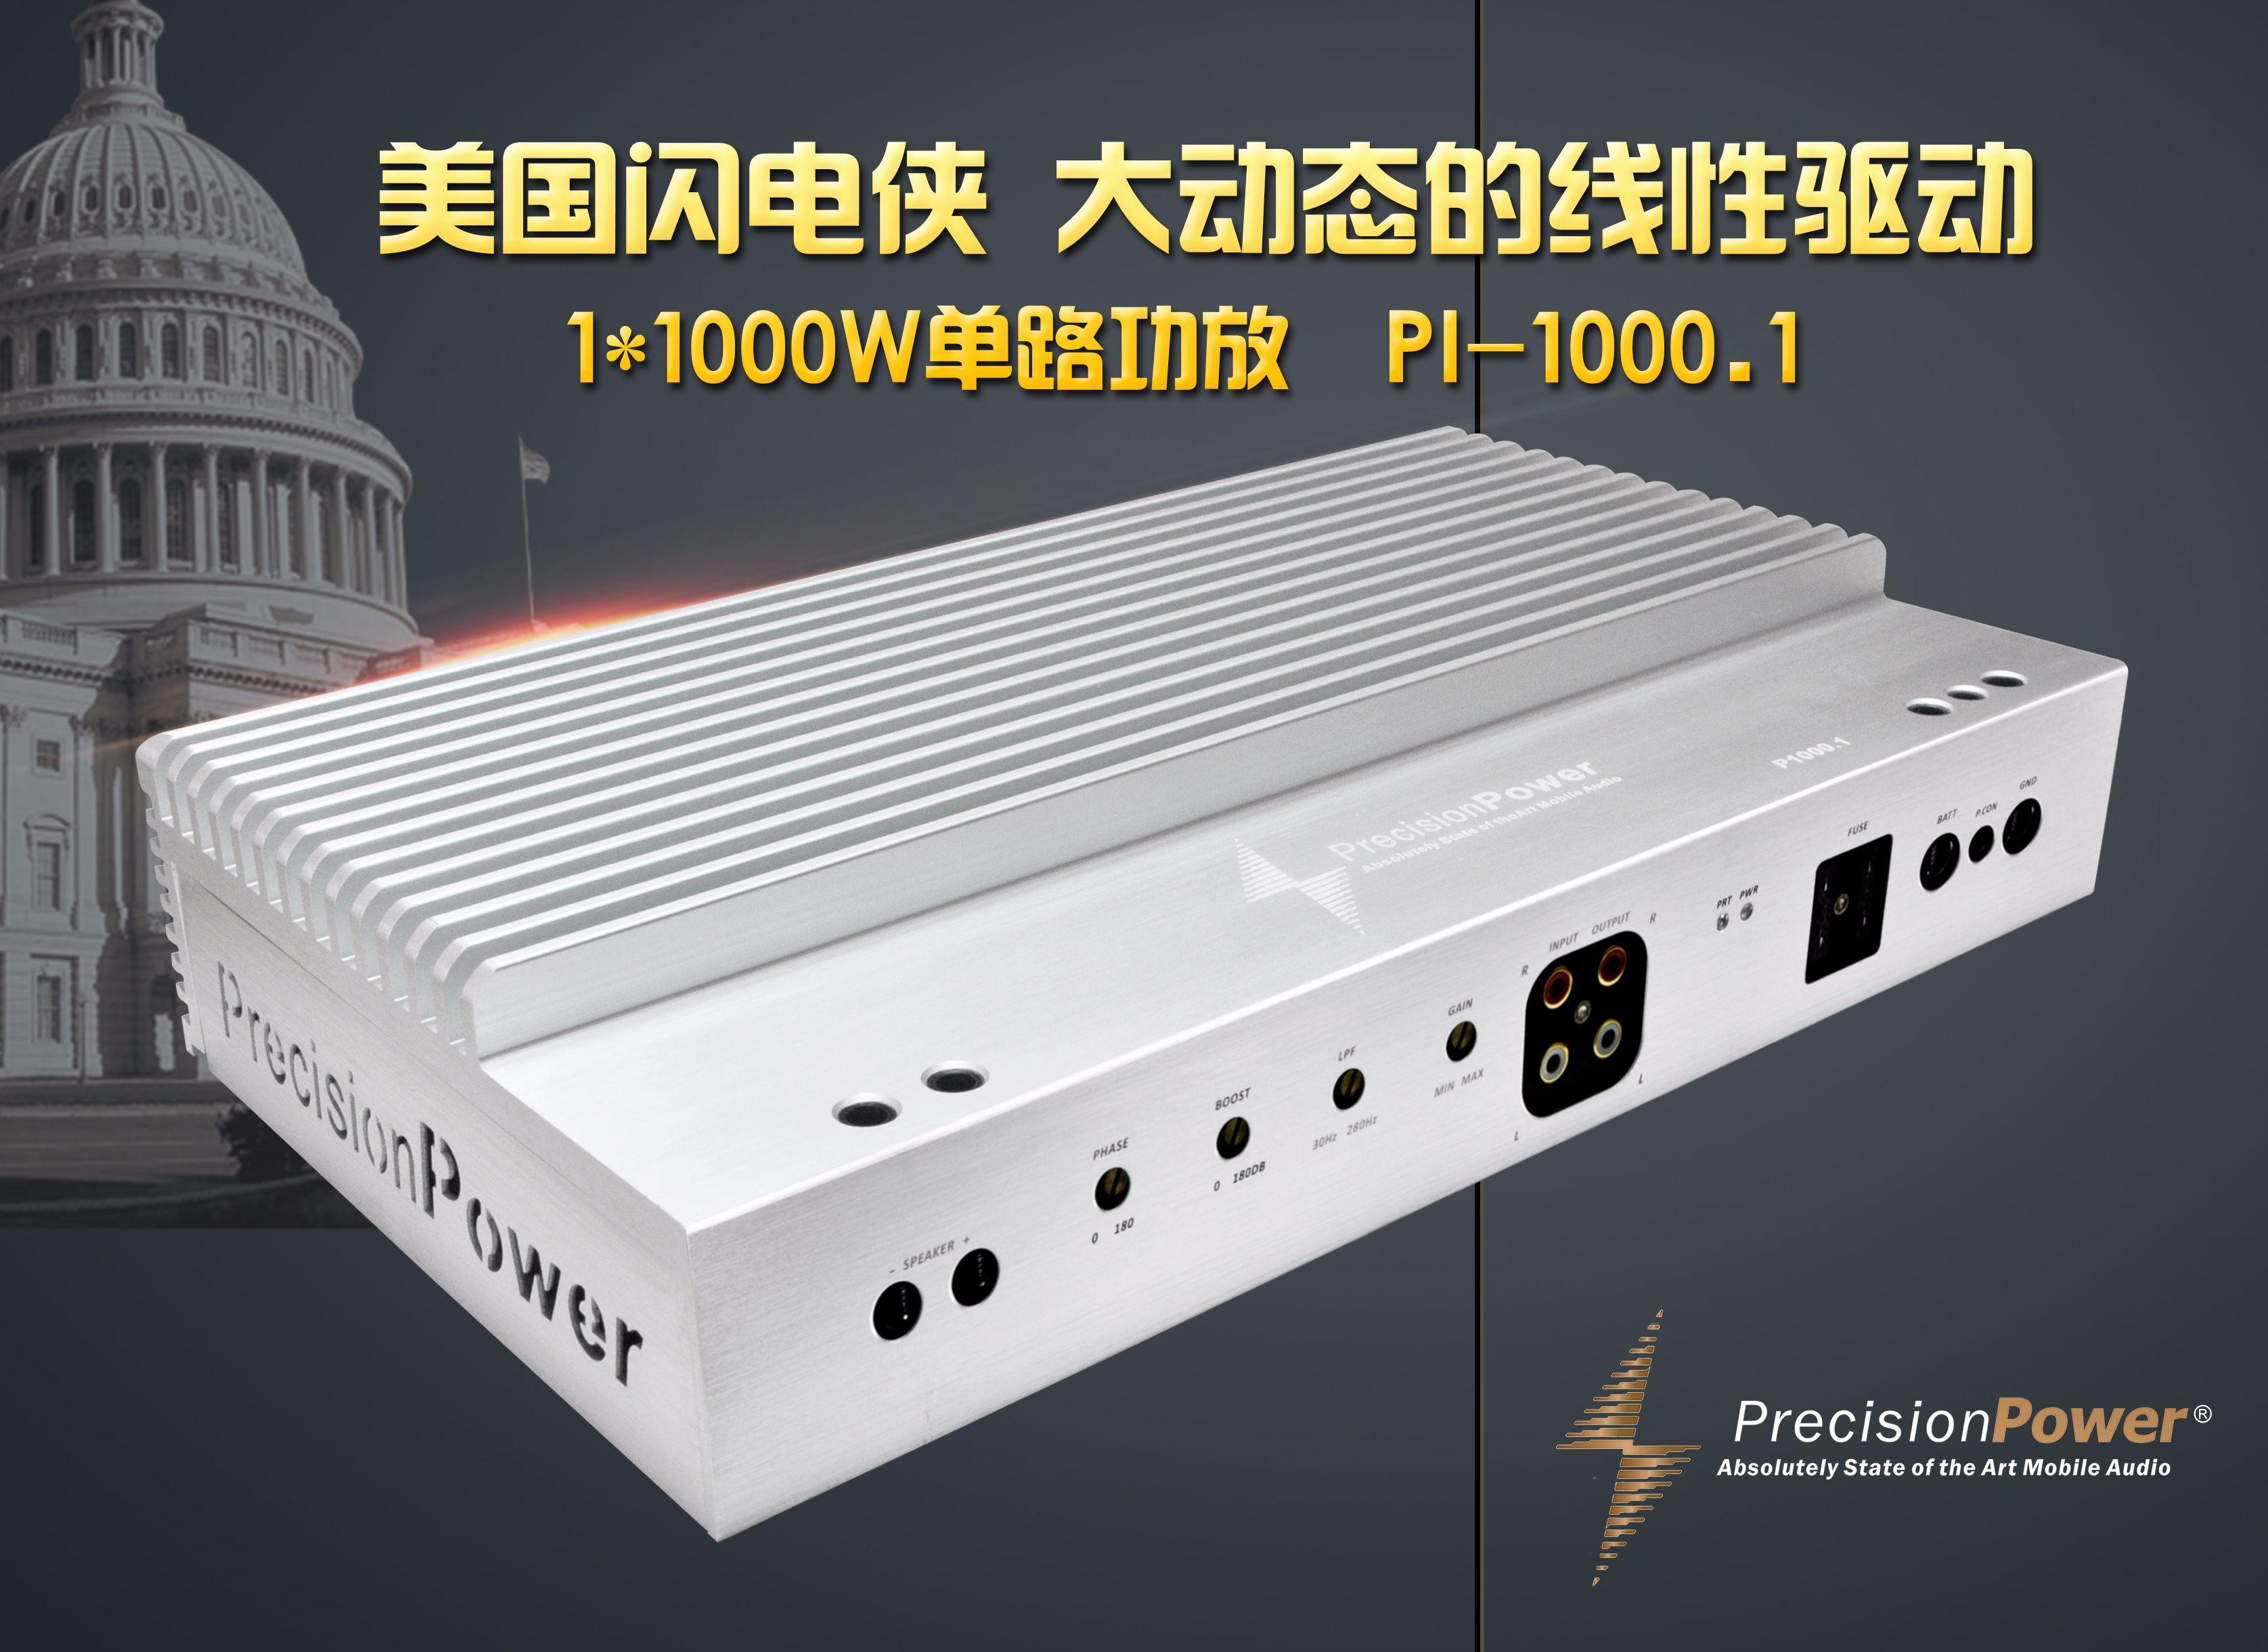 PI-1000.1